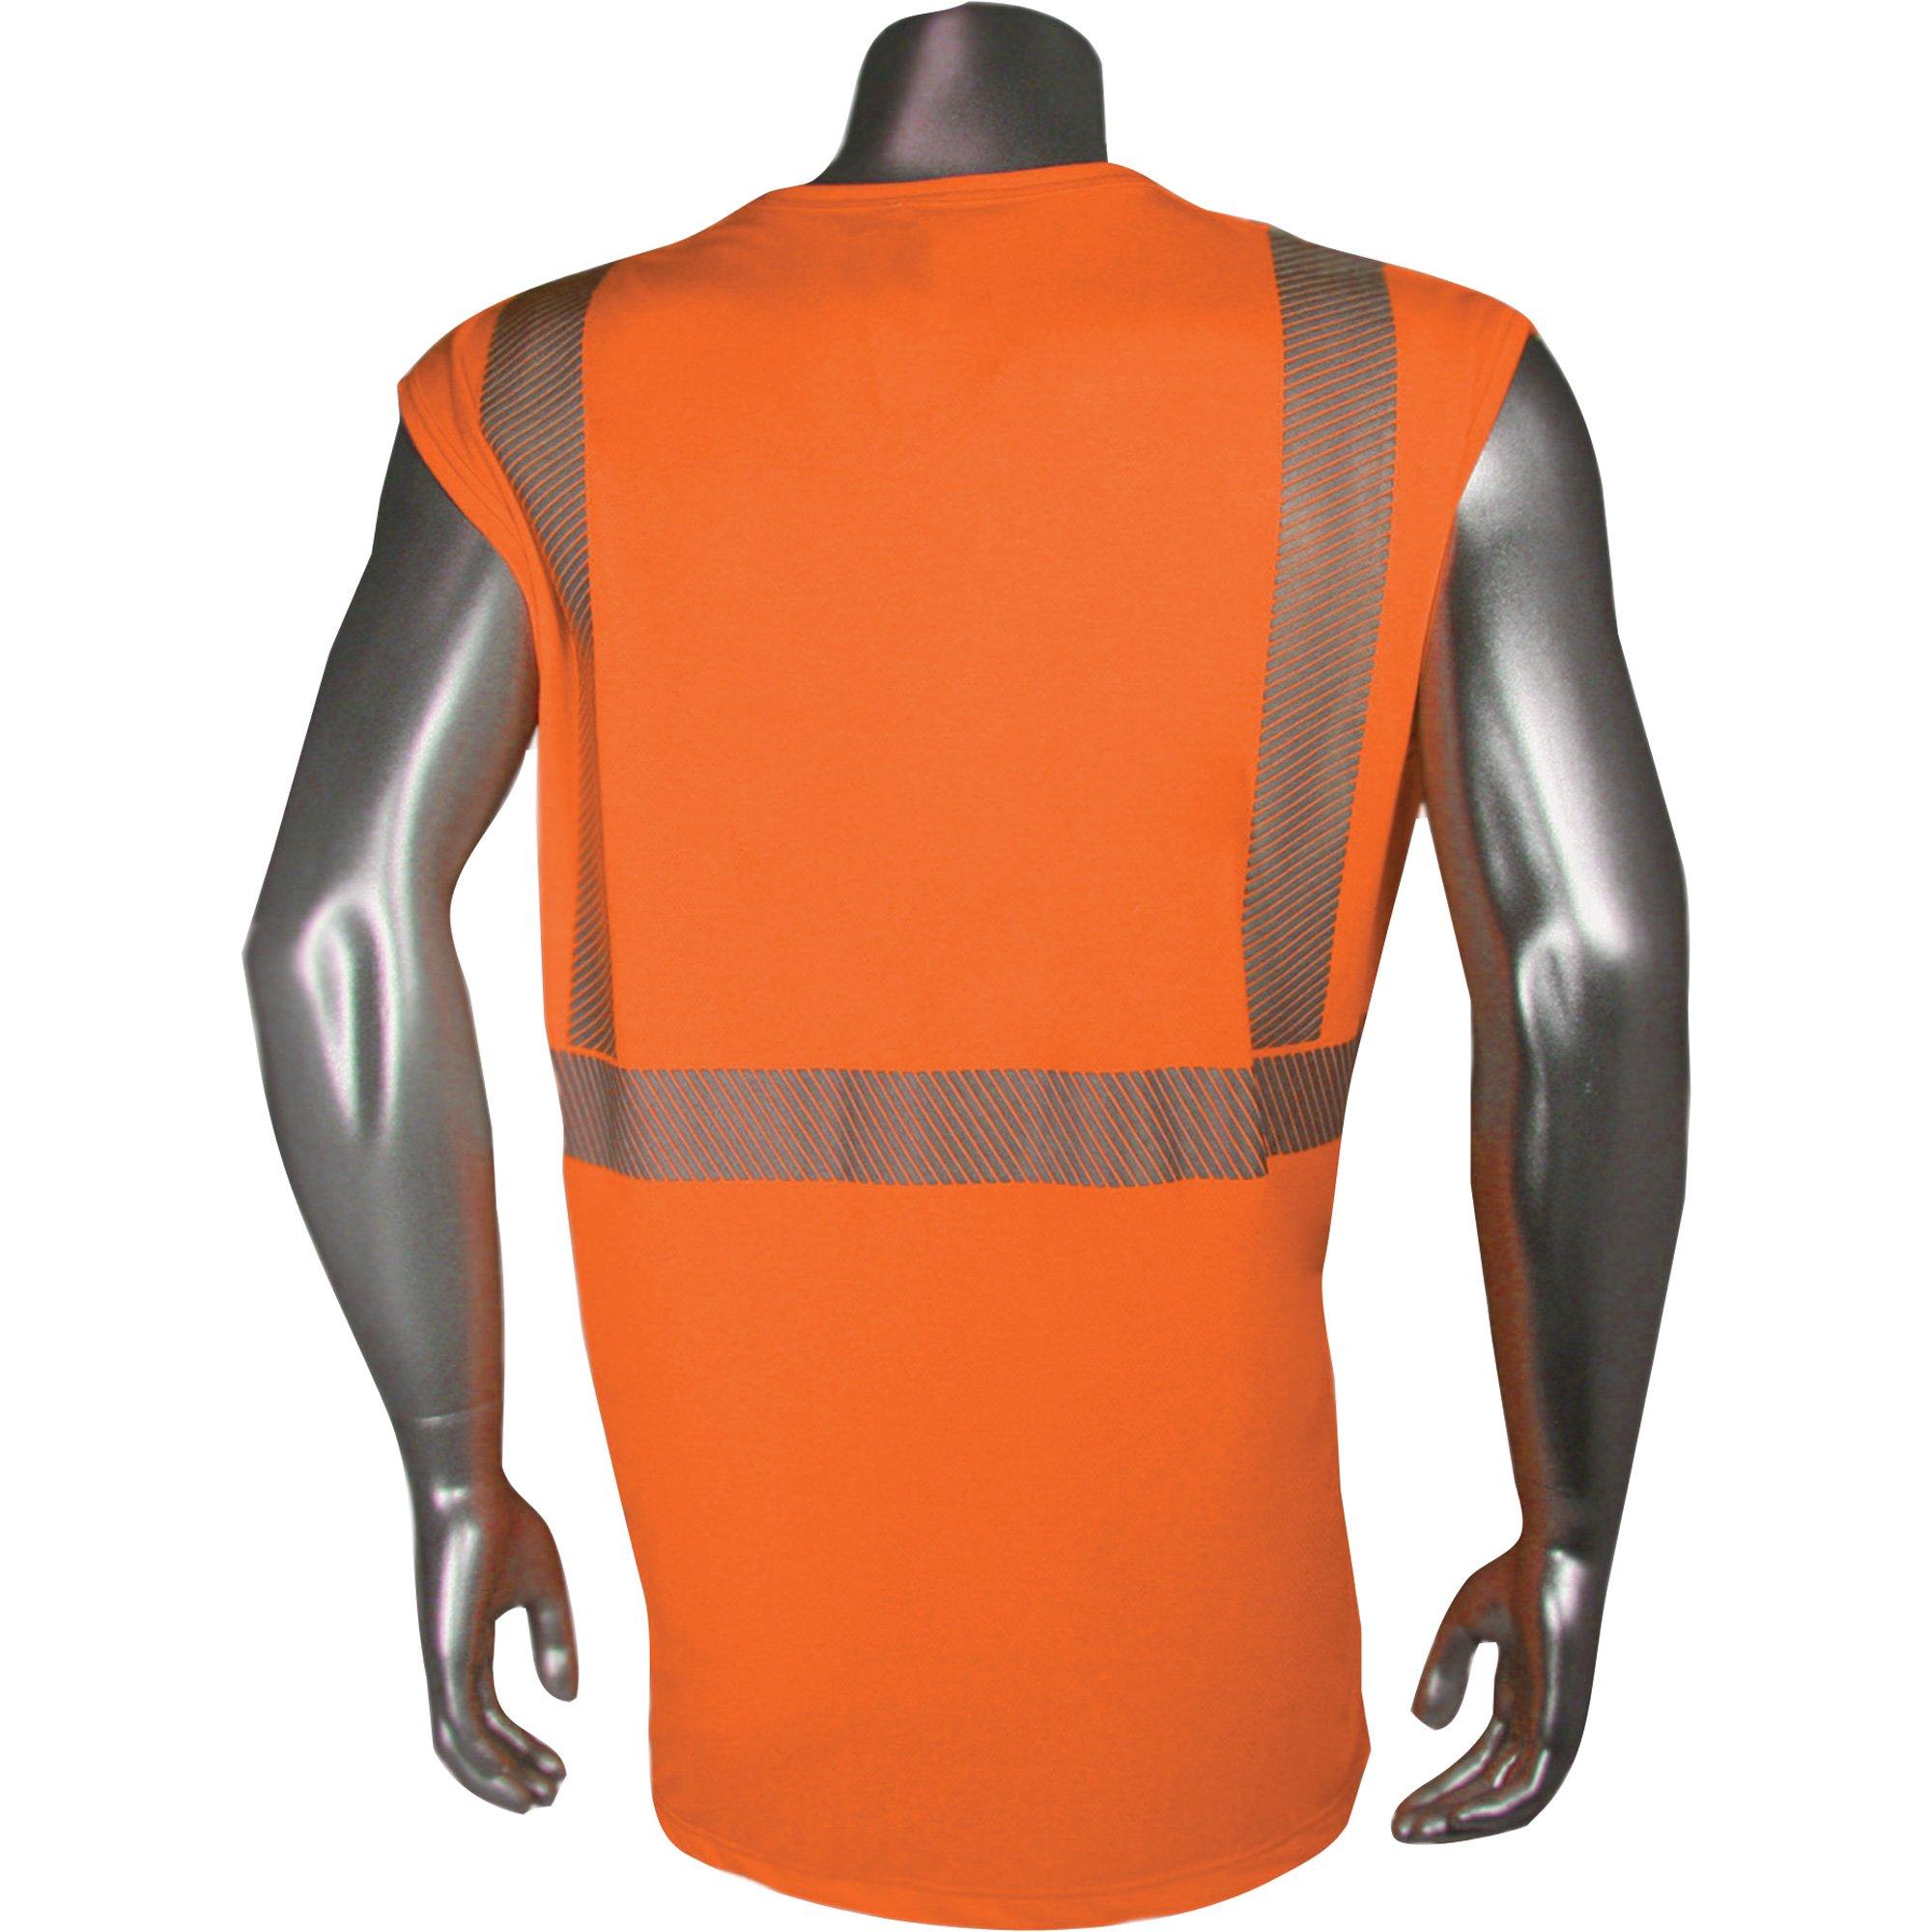 Radians RadWear USA Class 2 Breezelight Mesh Sleeveless Safety T-Shirt - Orange, XL, Model# HV-XTSARNS